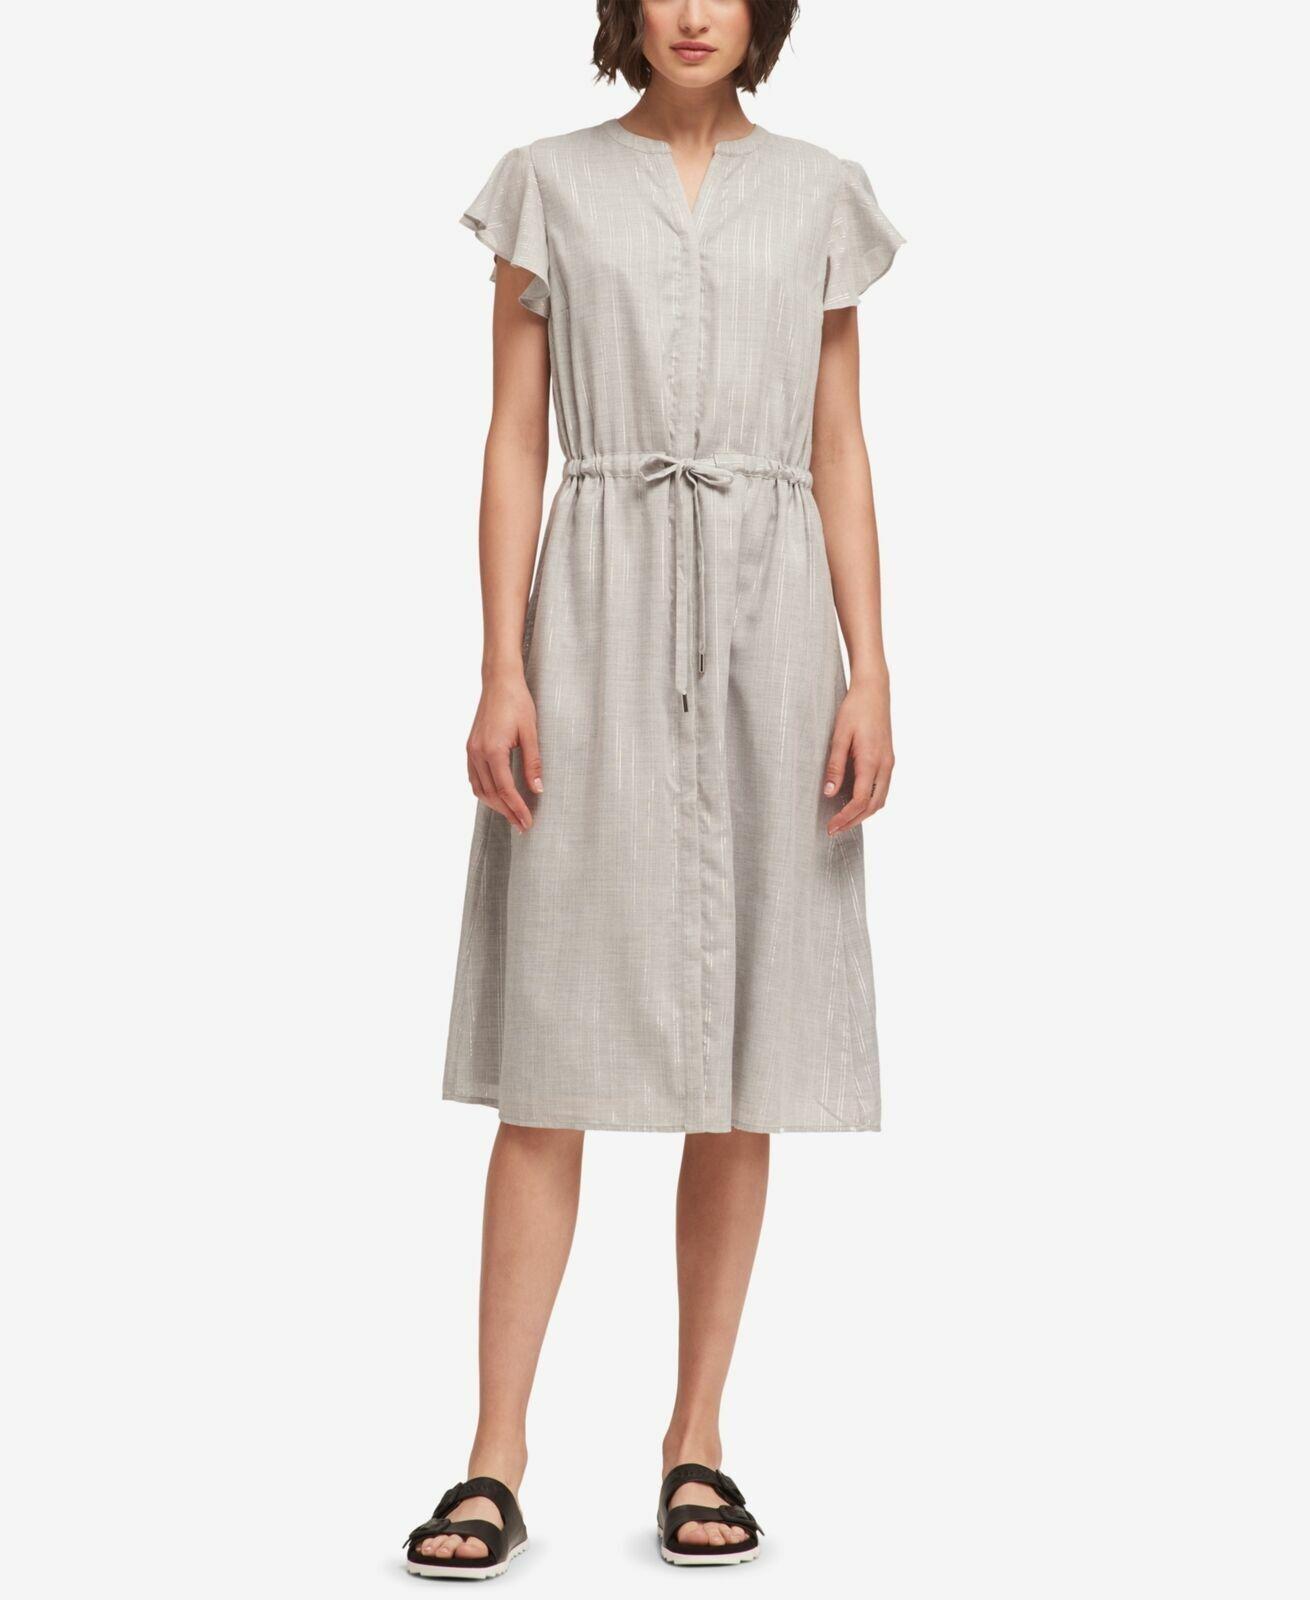 New  DKNY Shimmer-Stripe Flutter-Sleeve Heather grau Casual Dress Größe Large